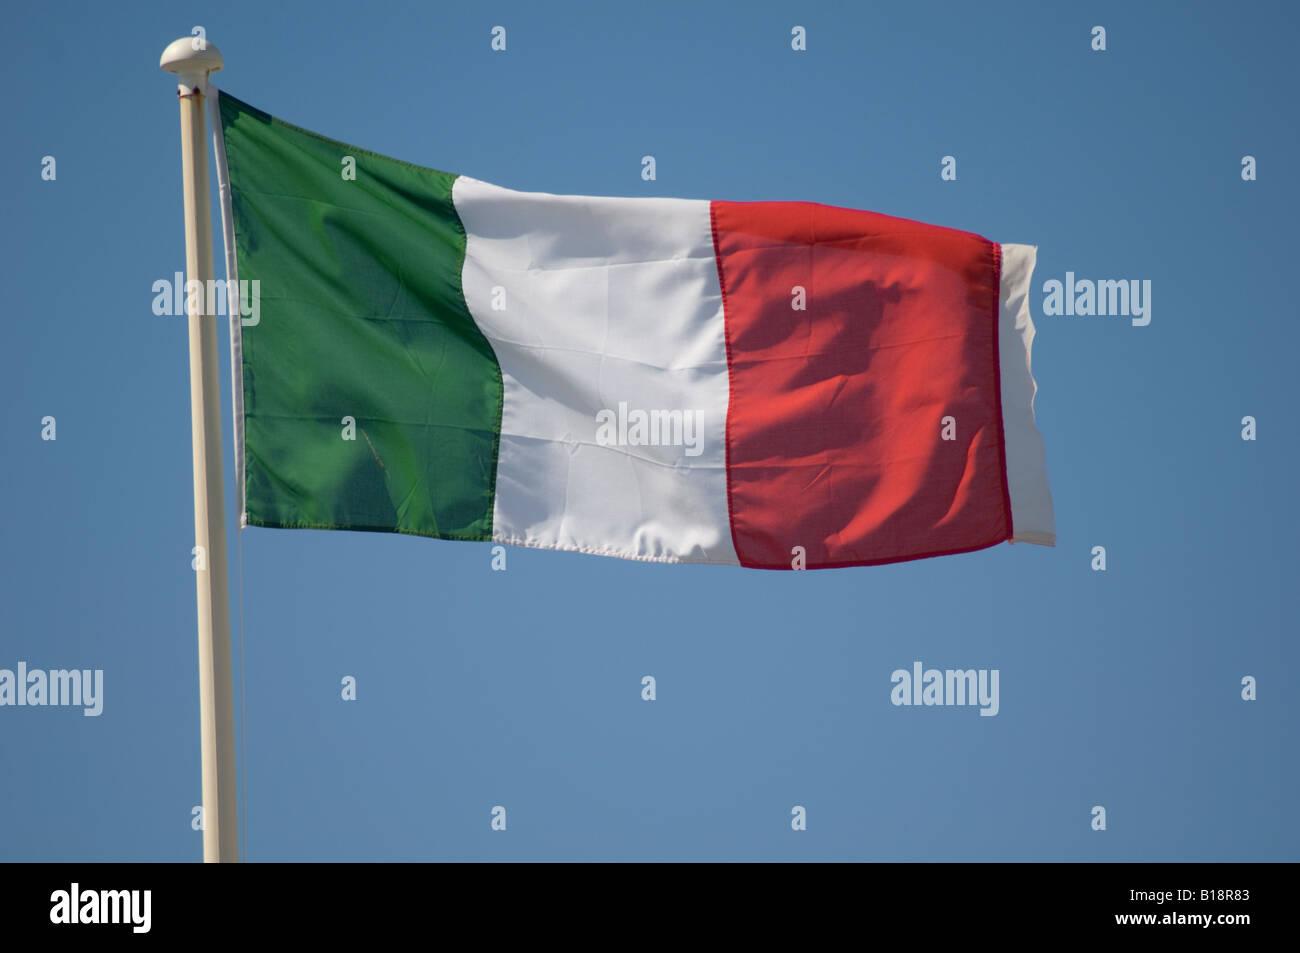 Italian Flag Stock Photos & Italian Flag Stock Images - Alamy - photo#8